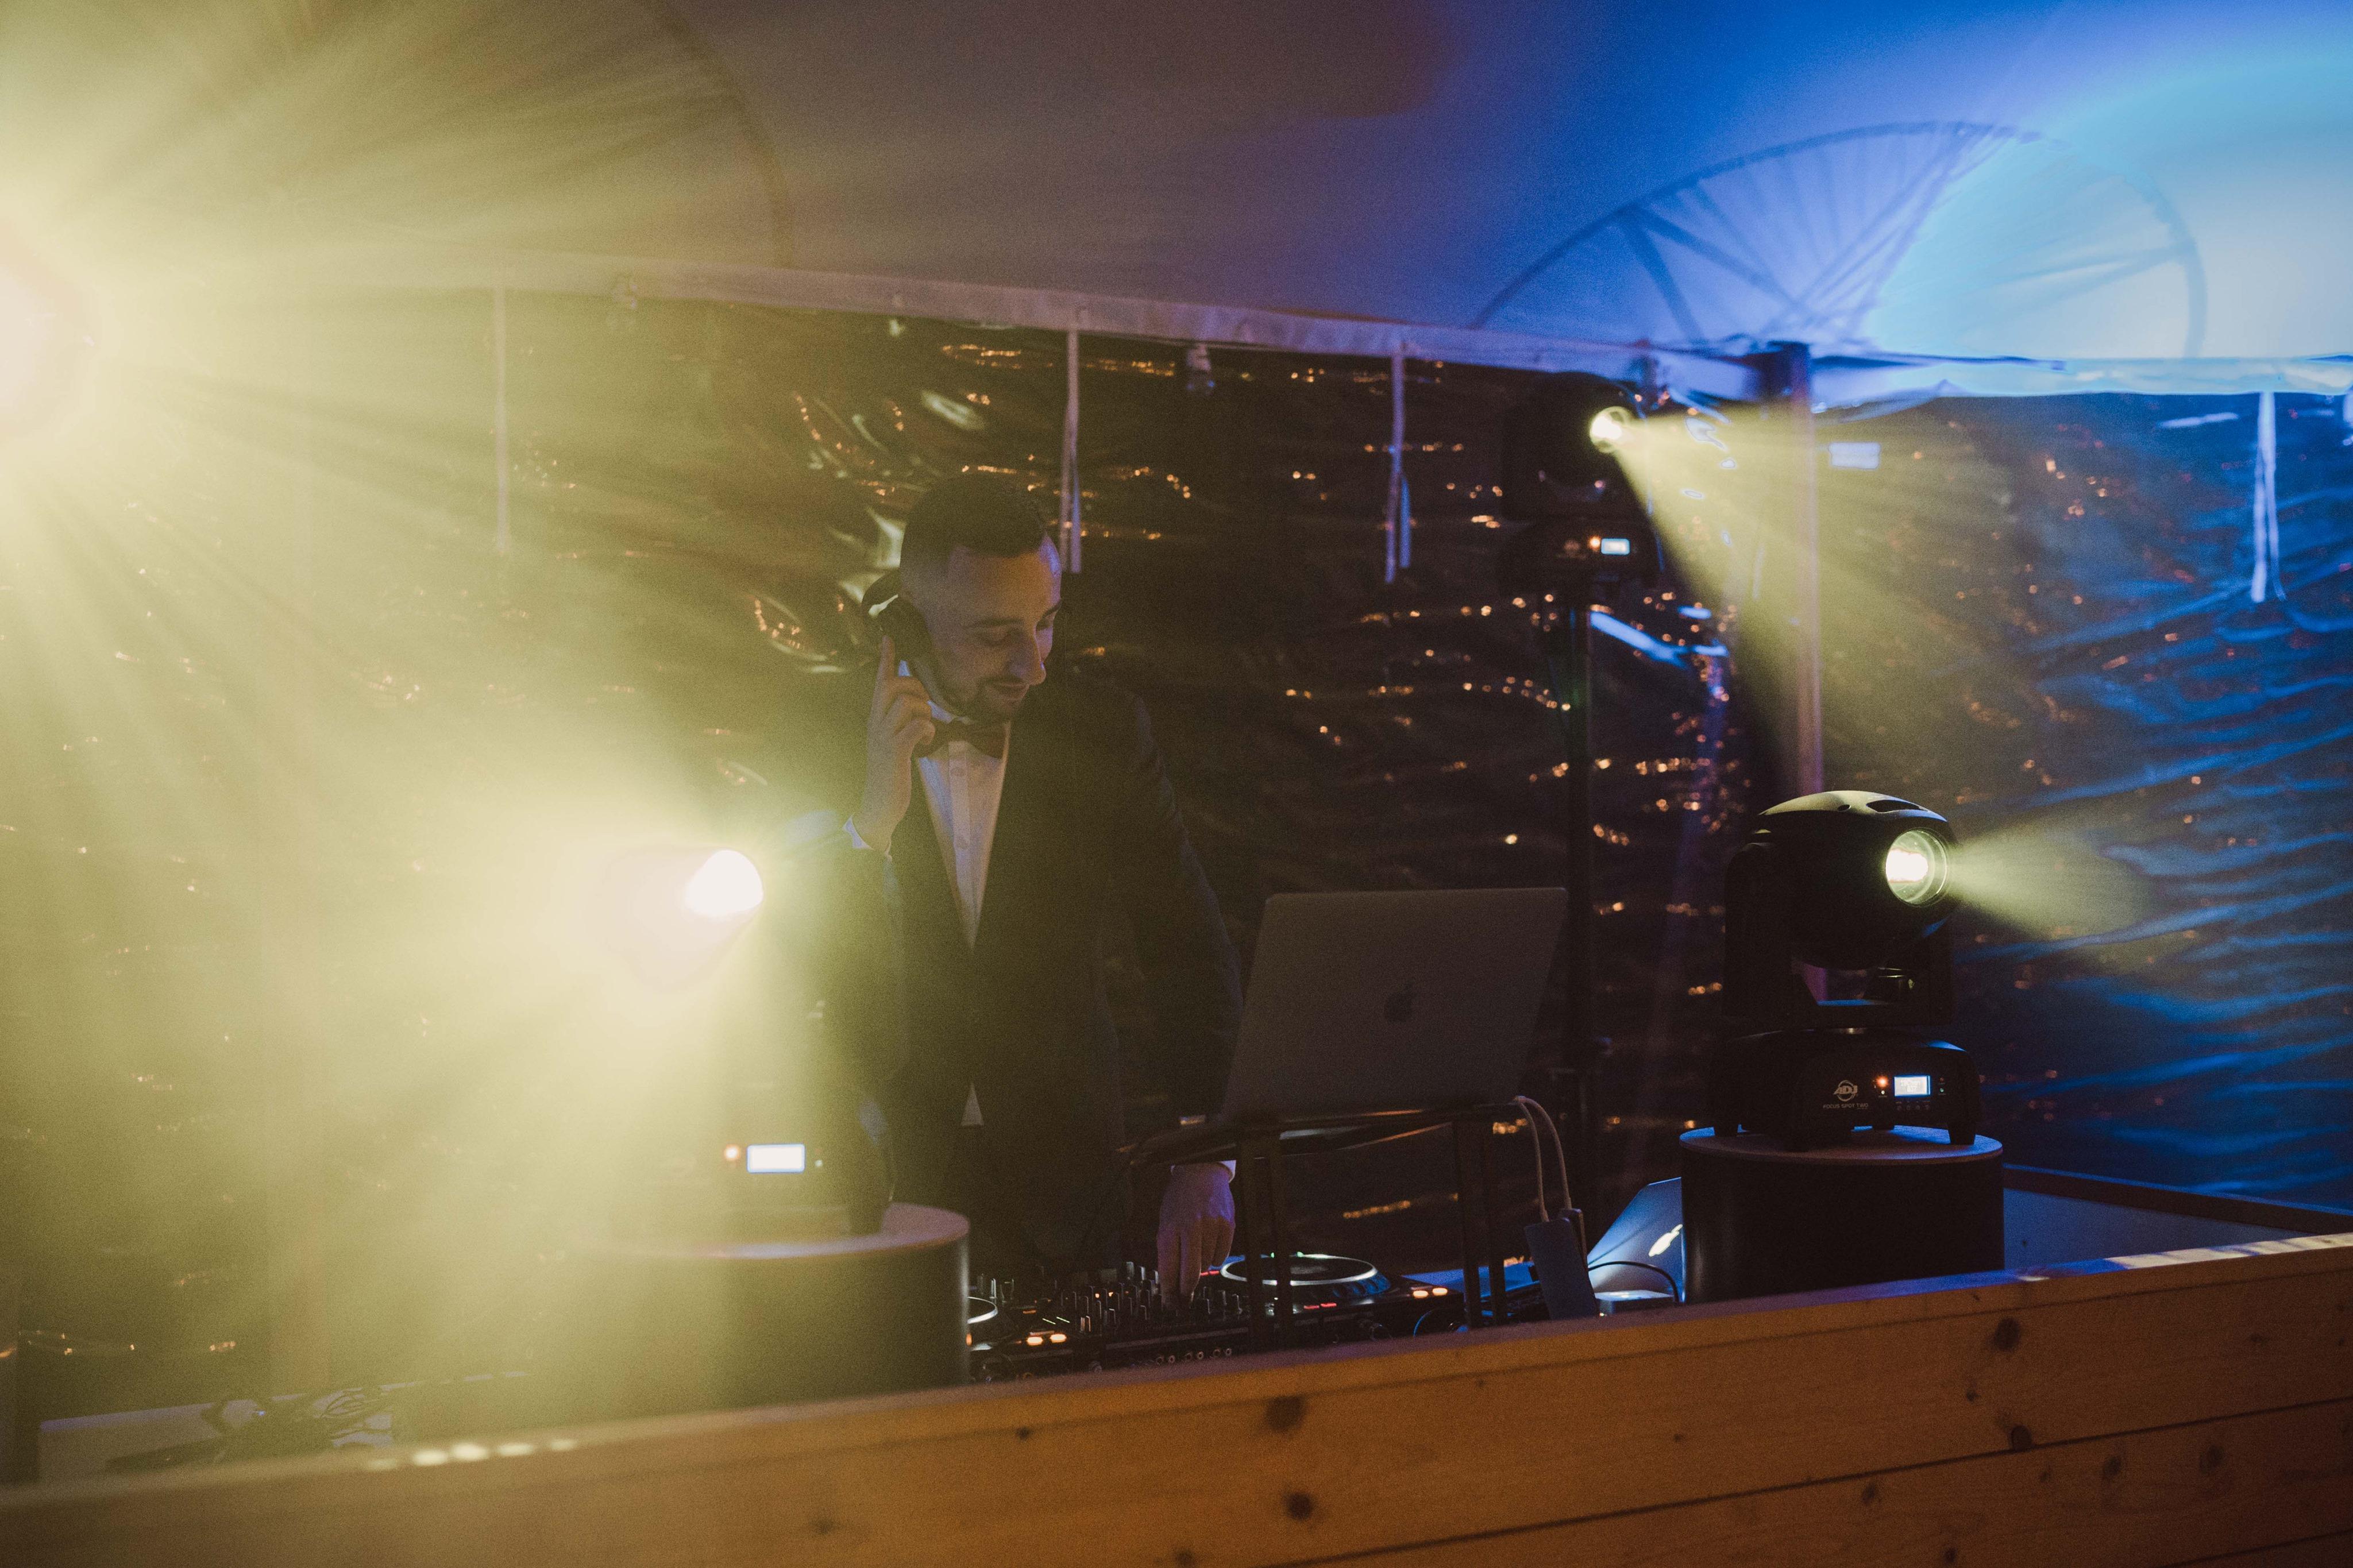 nasvietenie-osvetlenie-svadby-dj-mikejpg